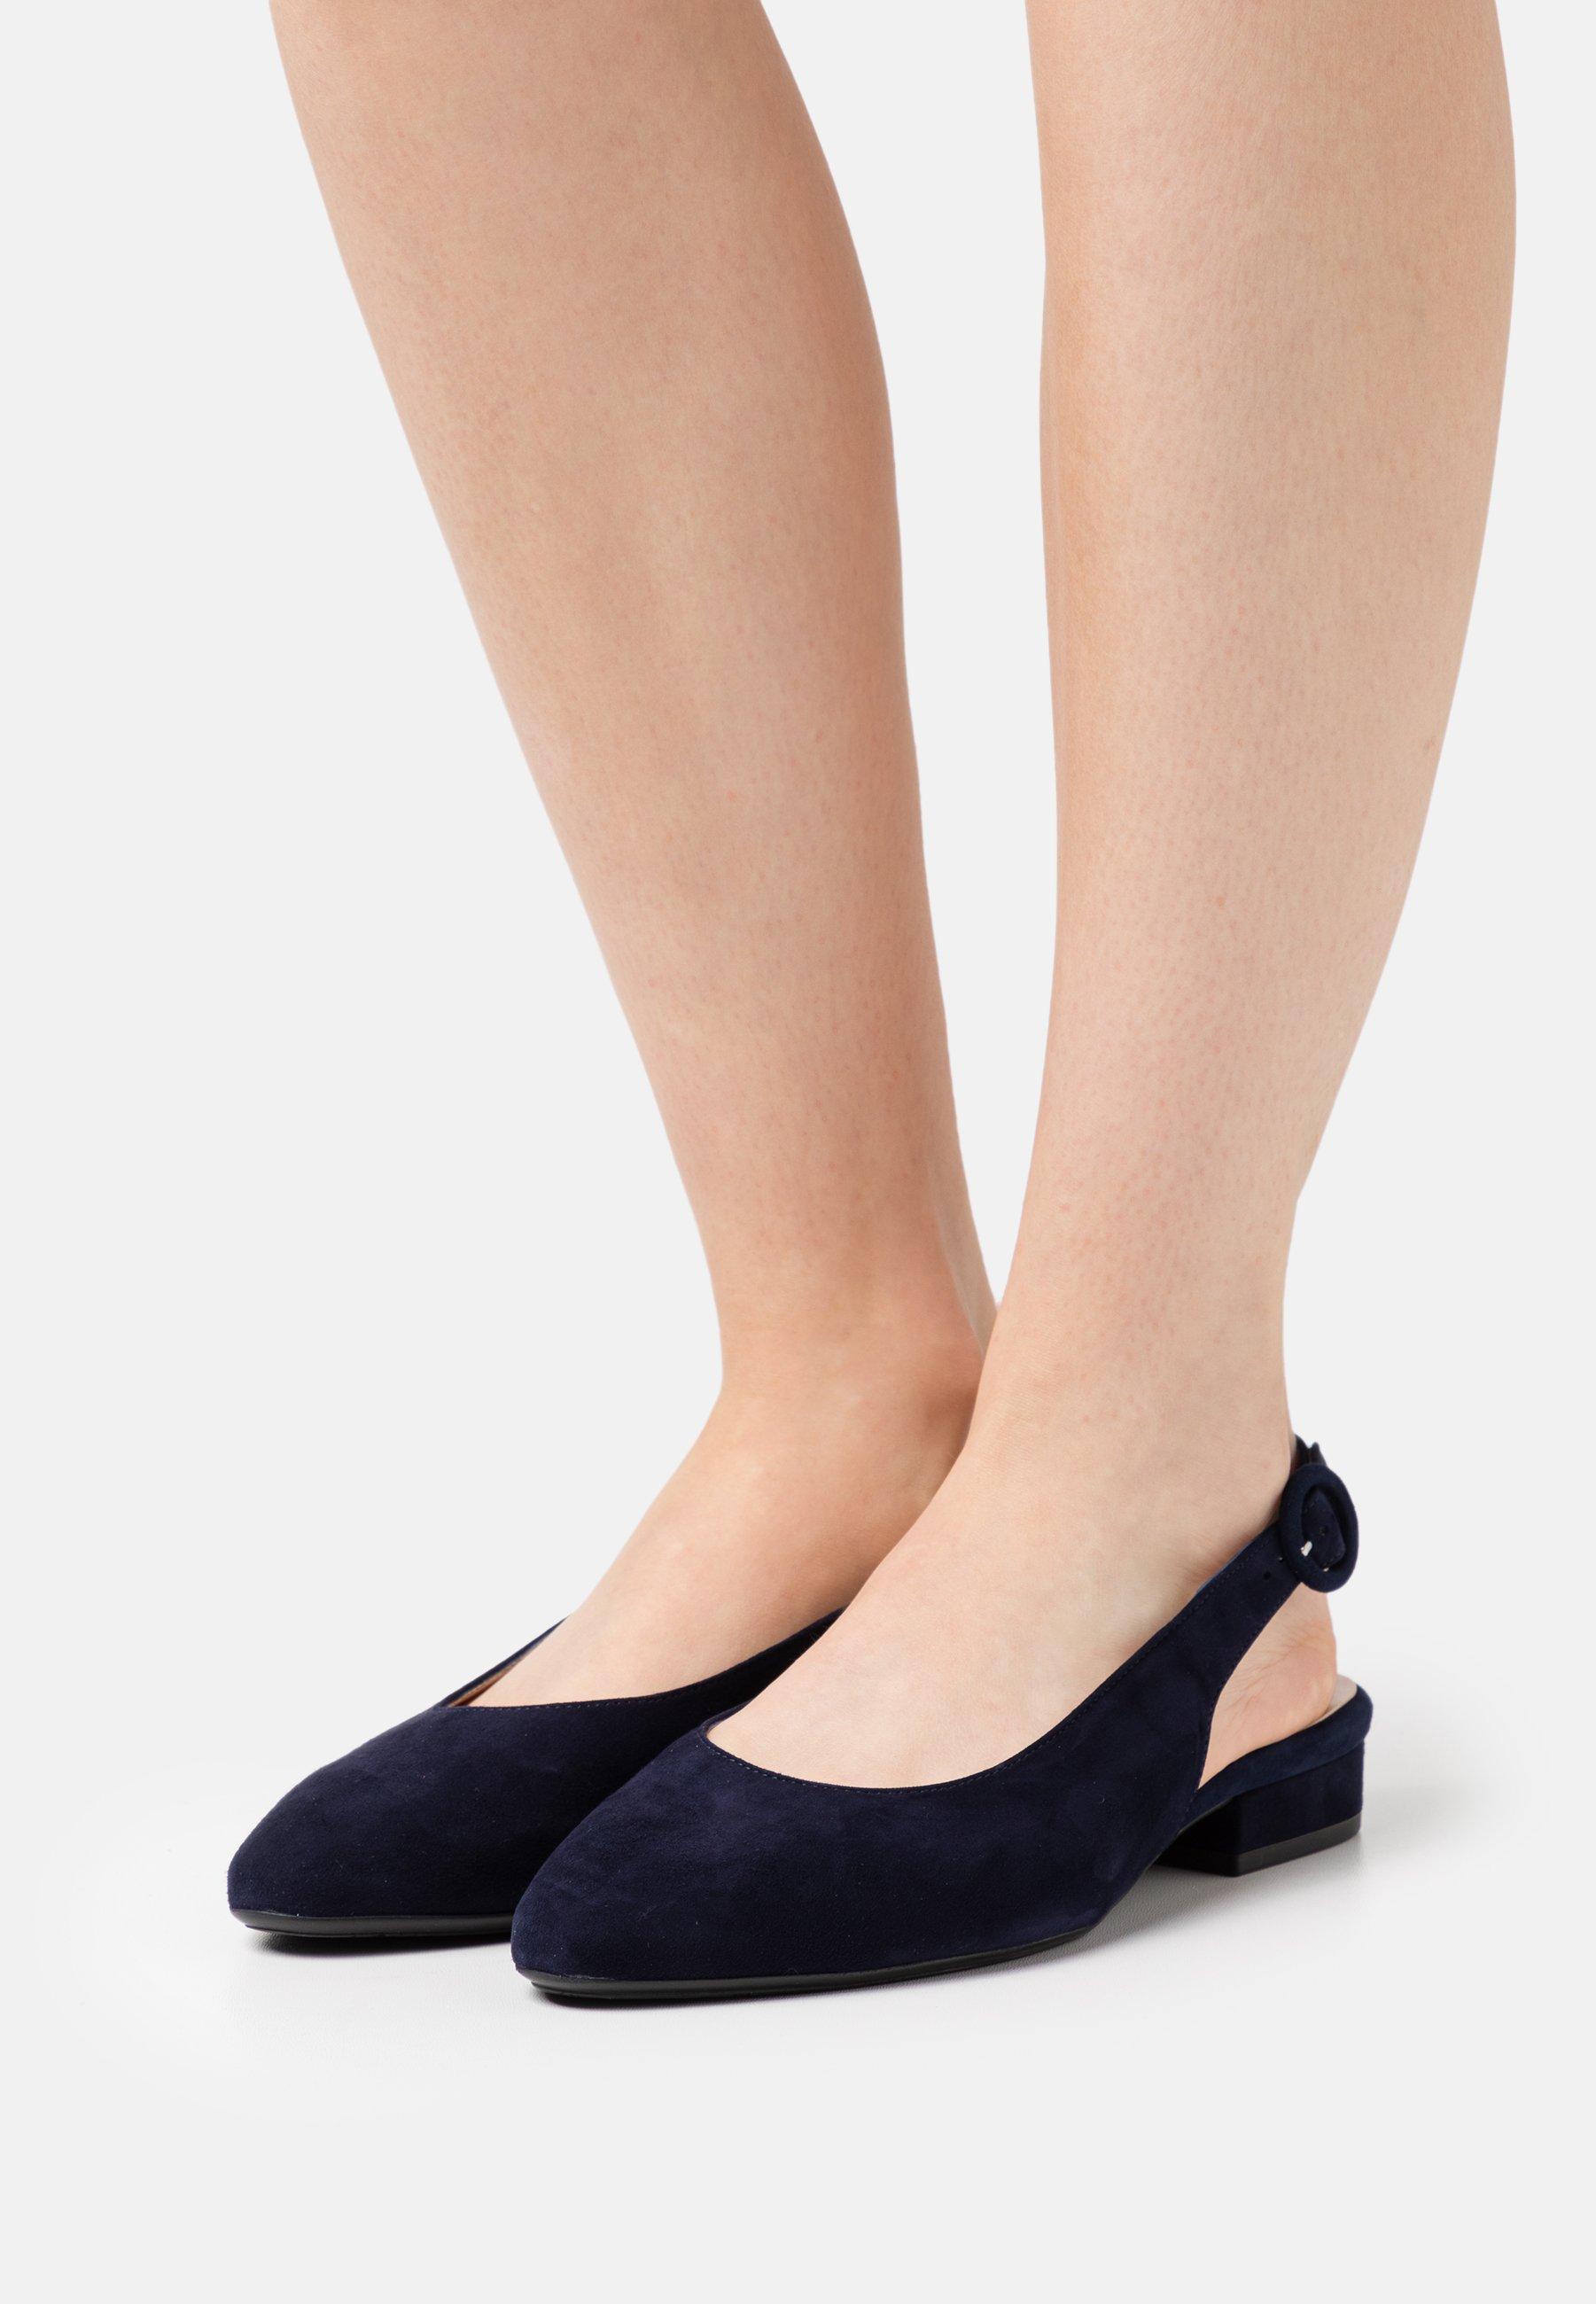 Women FASELLE - Slingback ballet pumps - notte